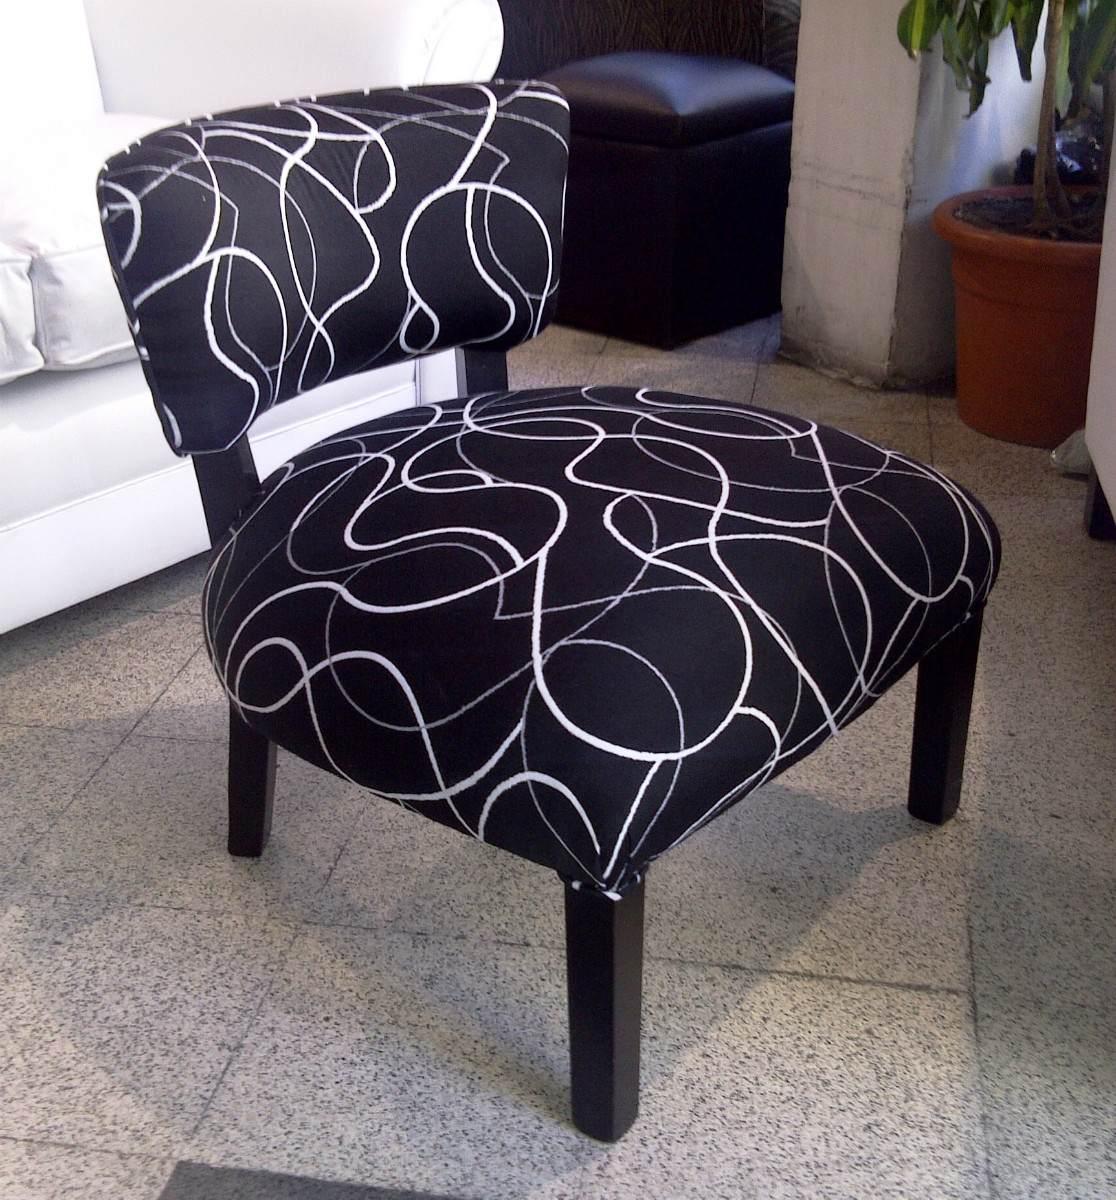 M s de 1000 im genes sobre muebles en pinterest sillas for Sillas tipo sillon